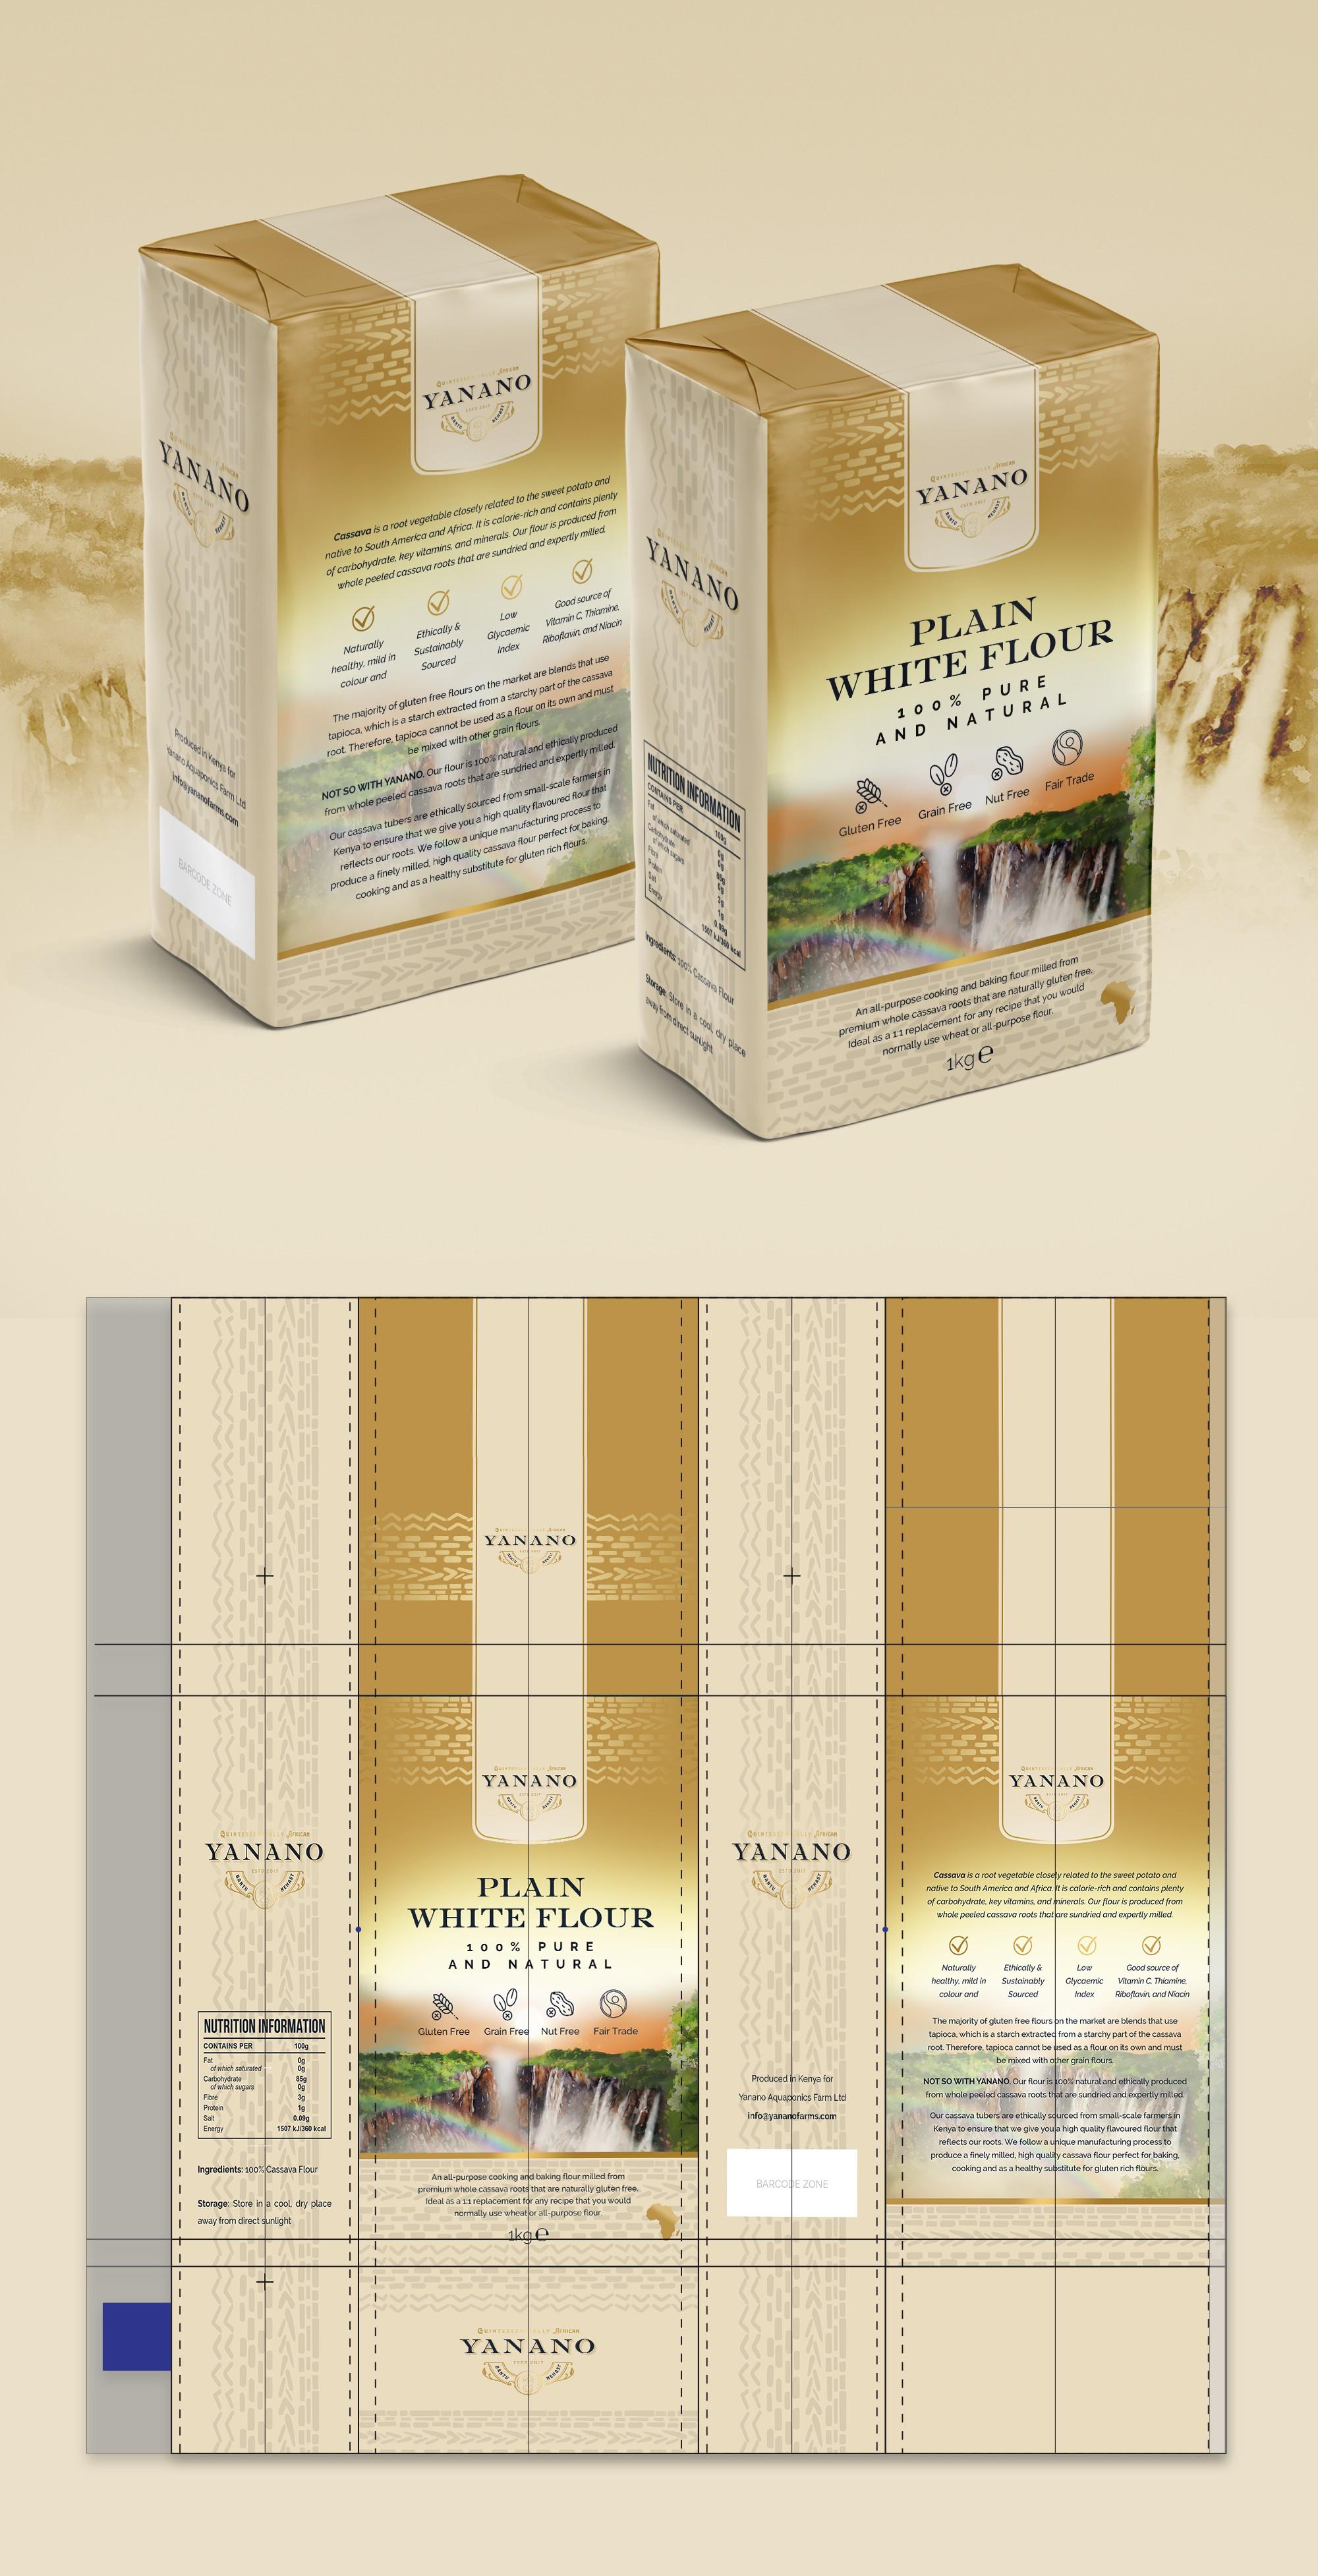 range of organic products